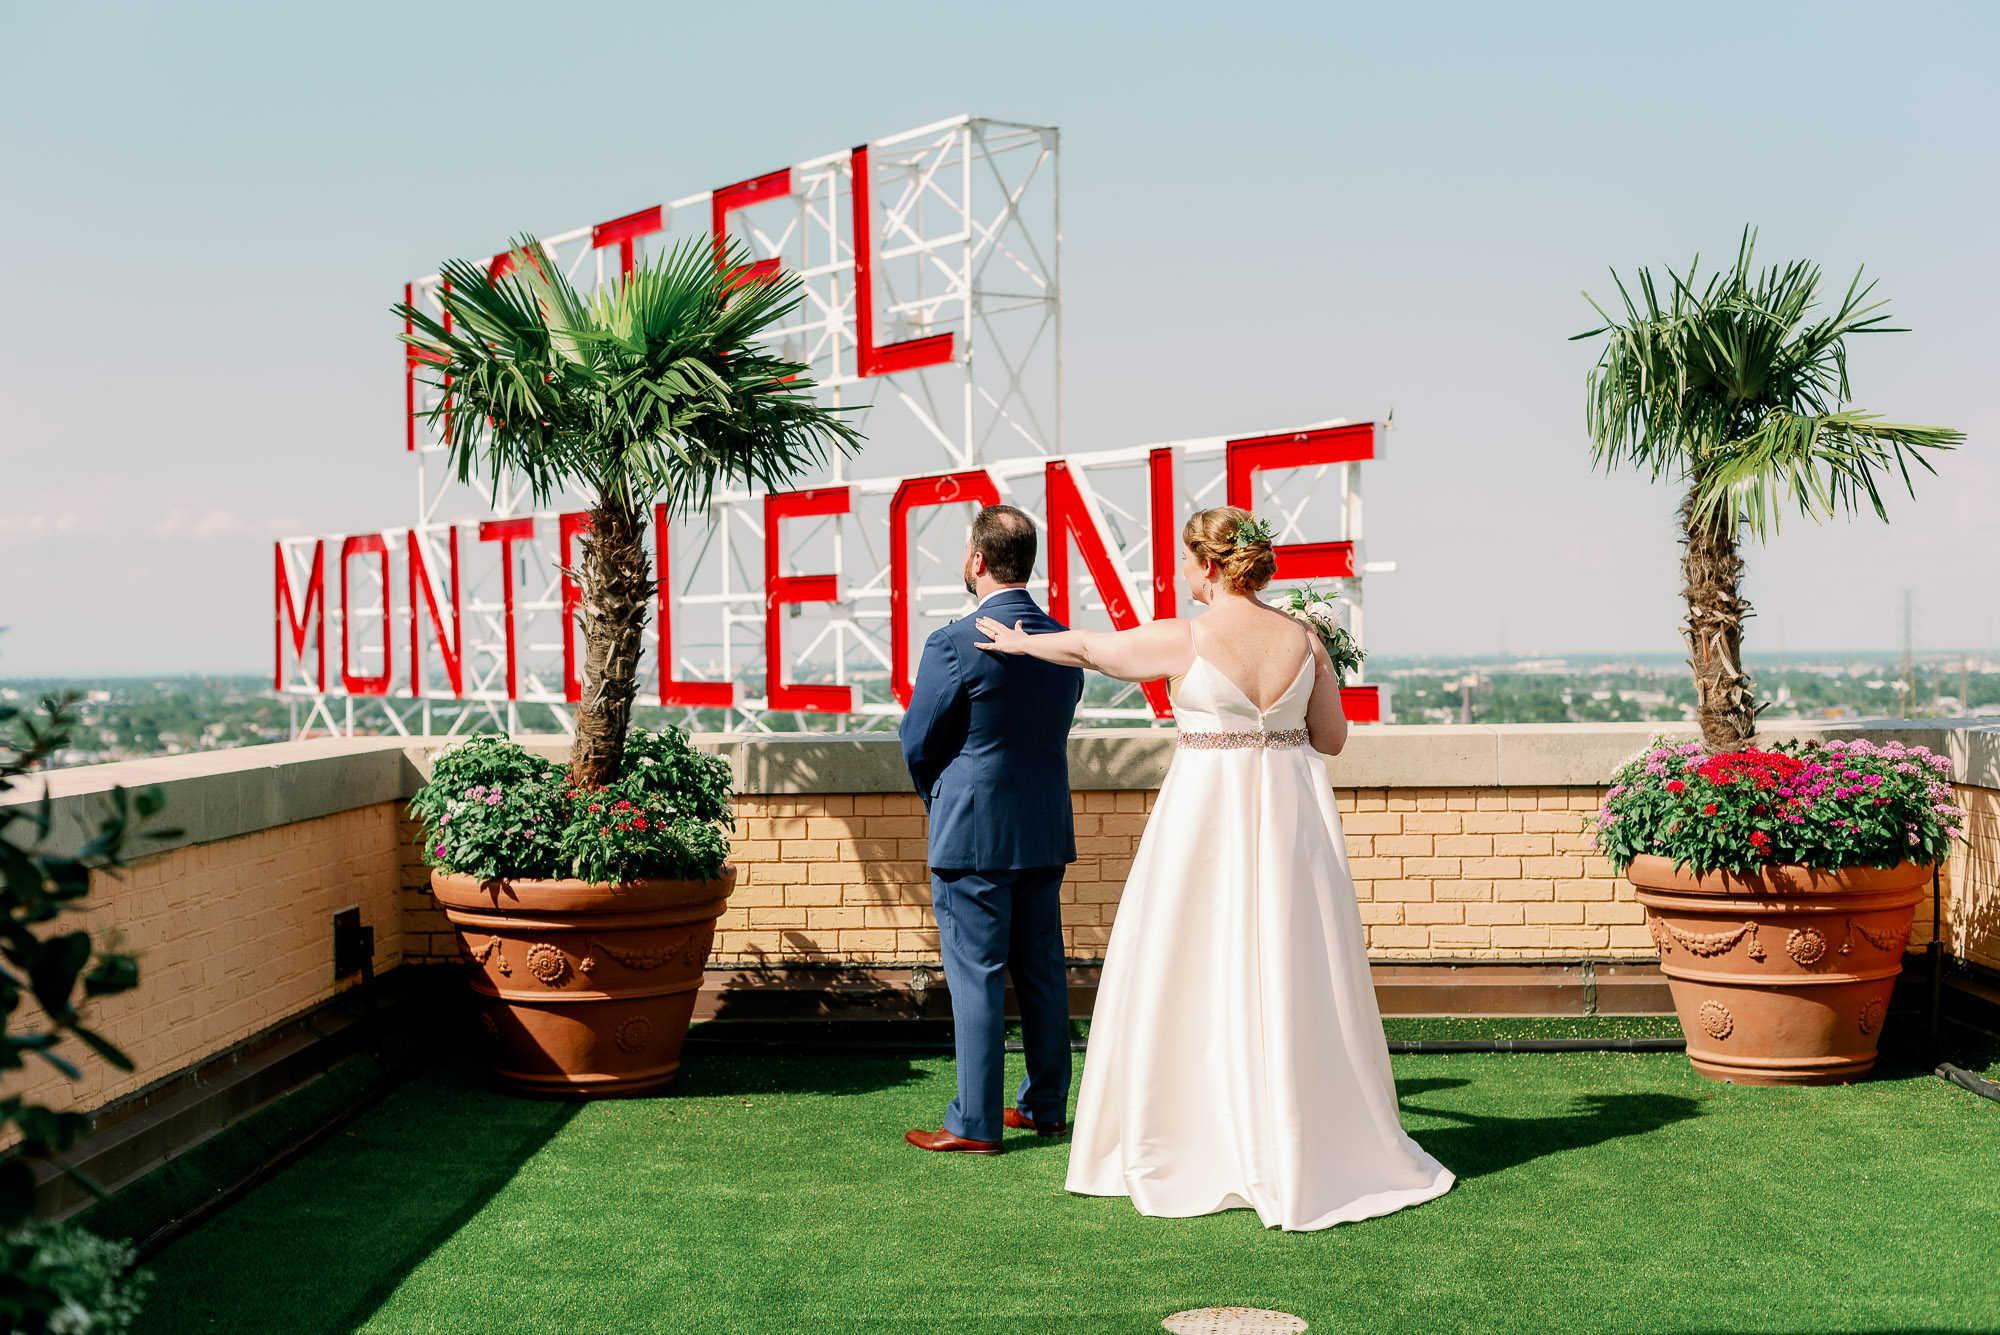 Marche New Orleans Wedding Venue Photographer (11).jpg